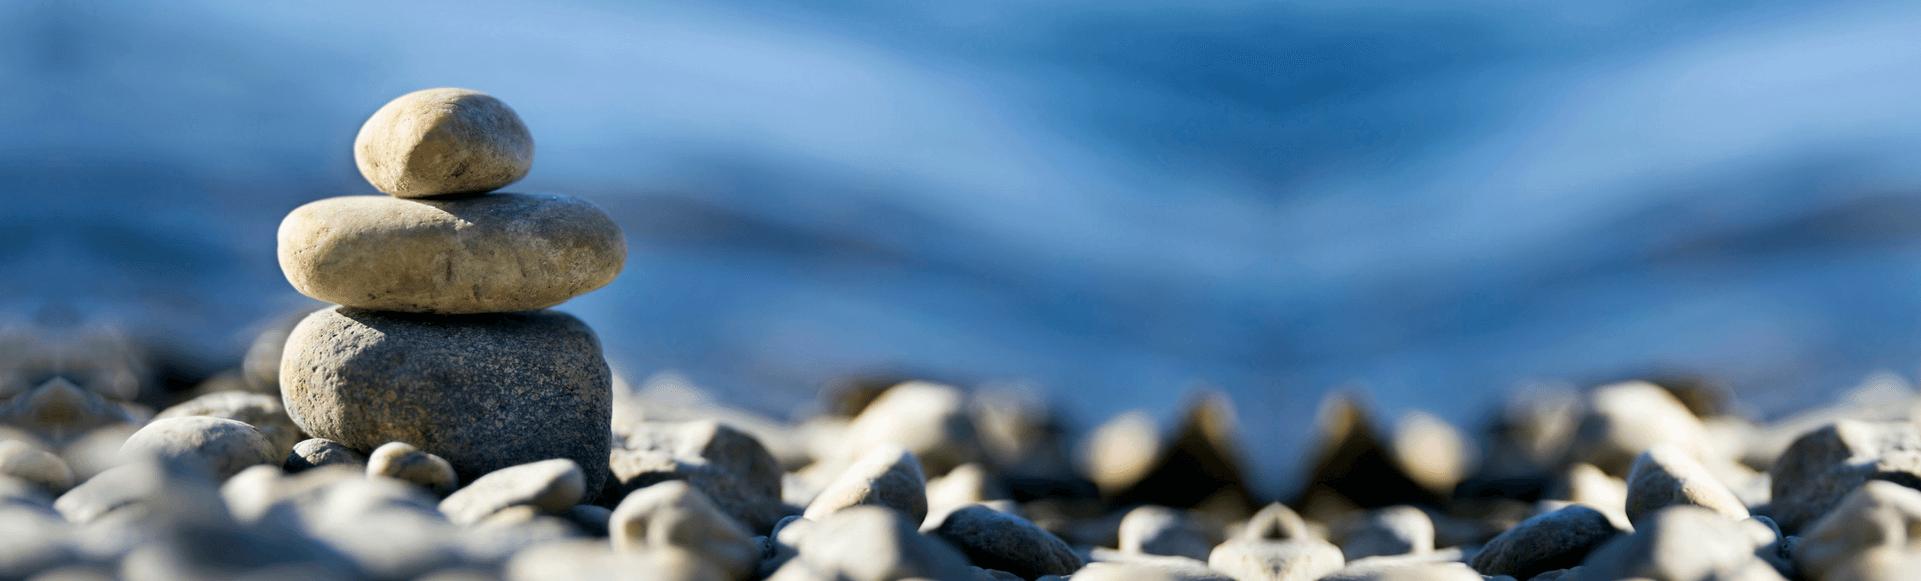 Wellness & Yoga Retreats The Active Passport